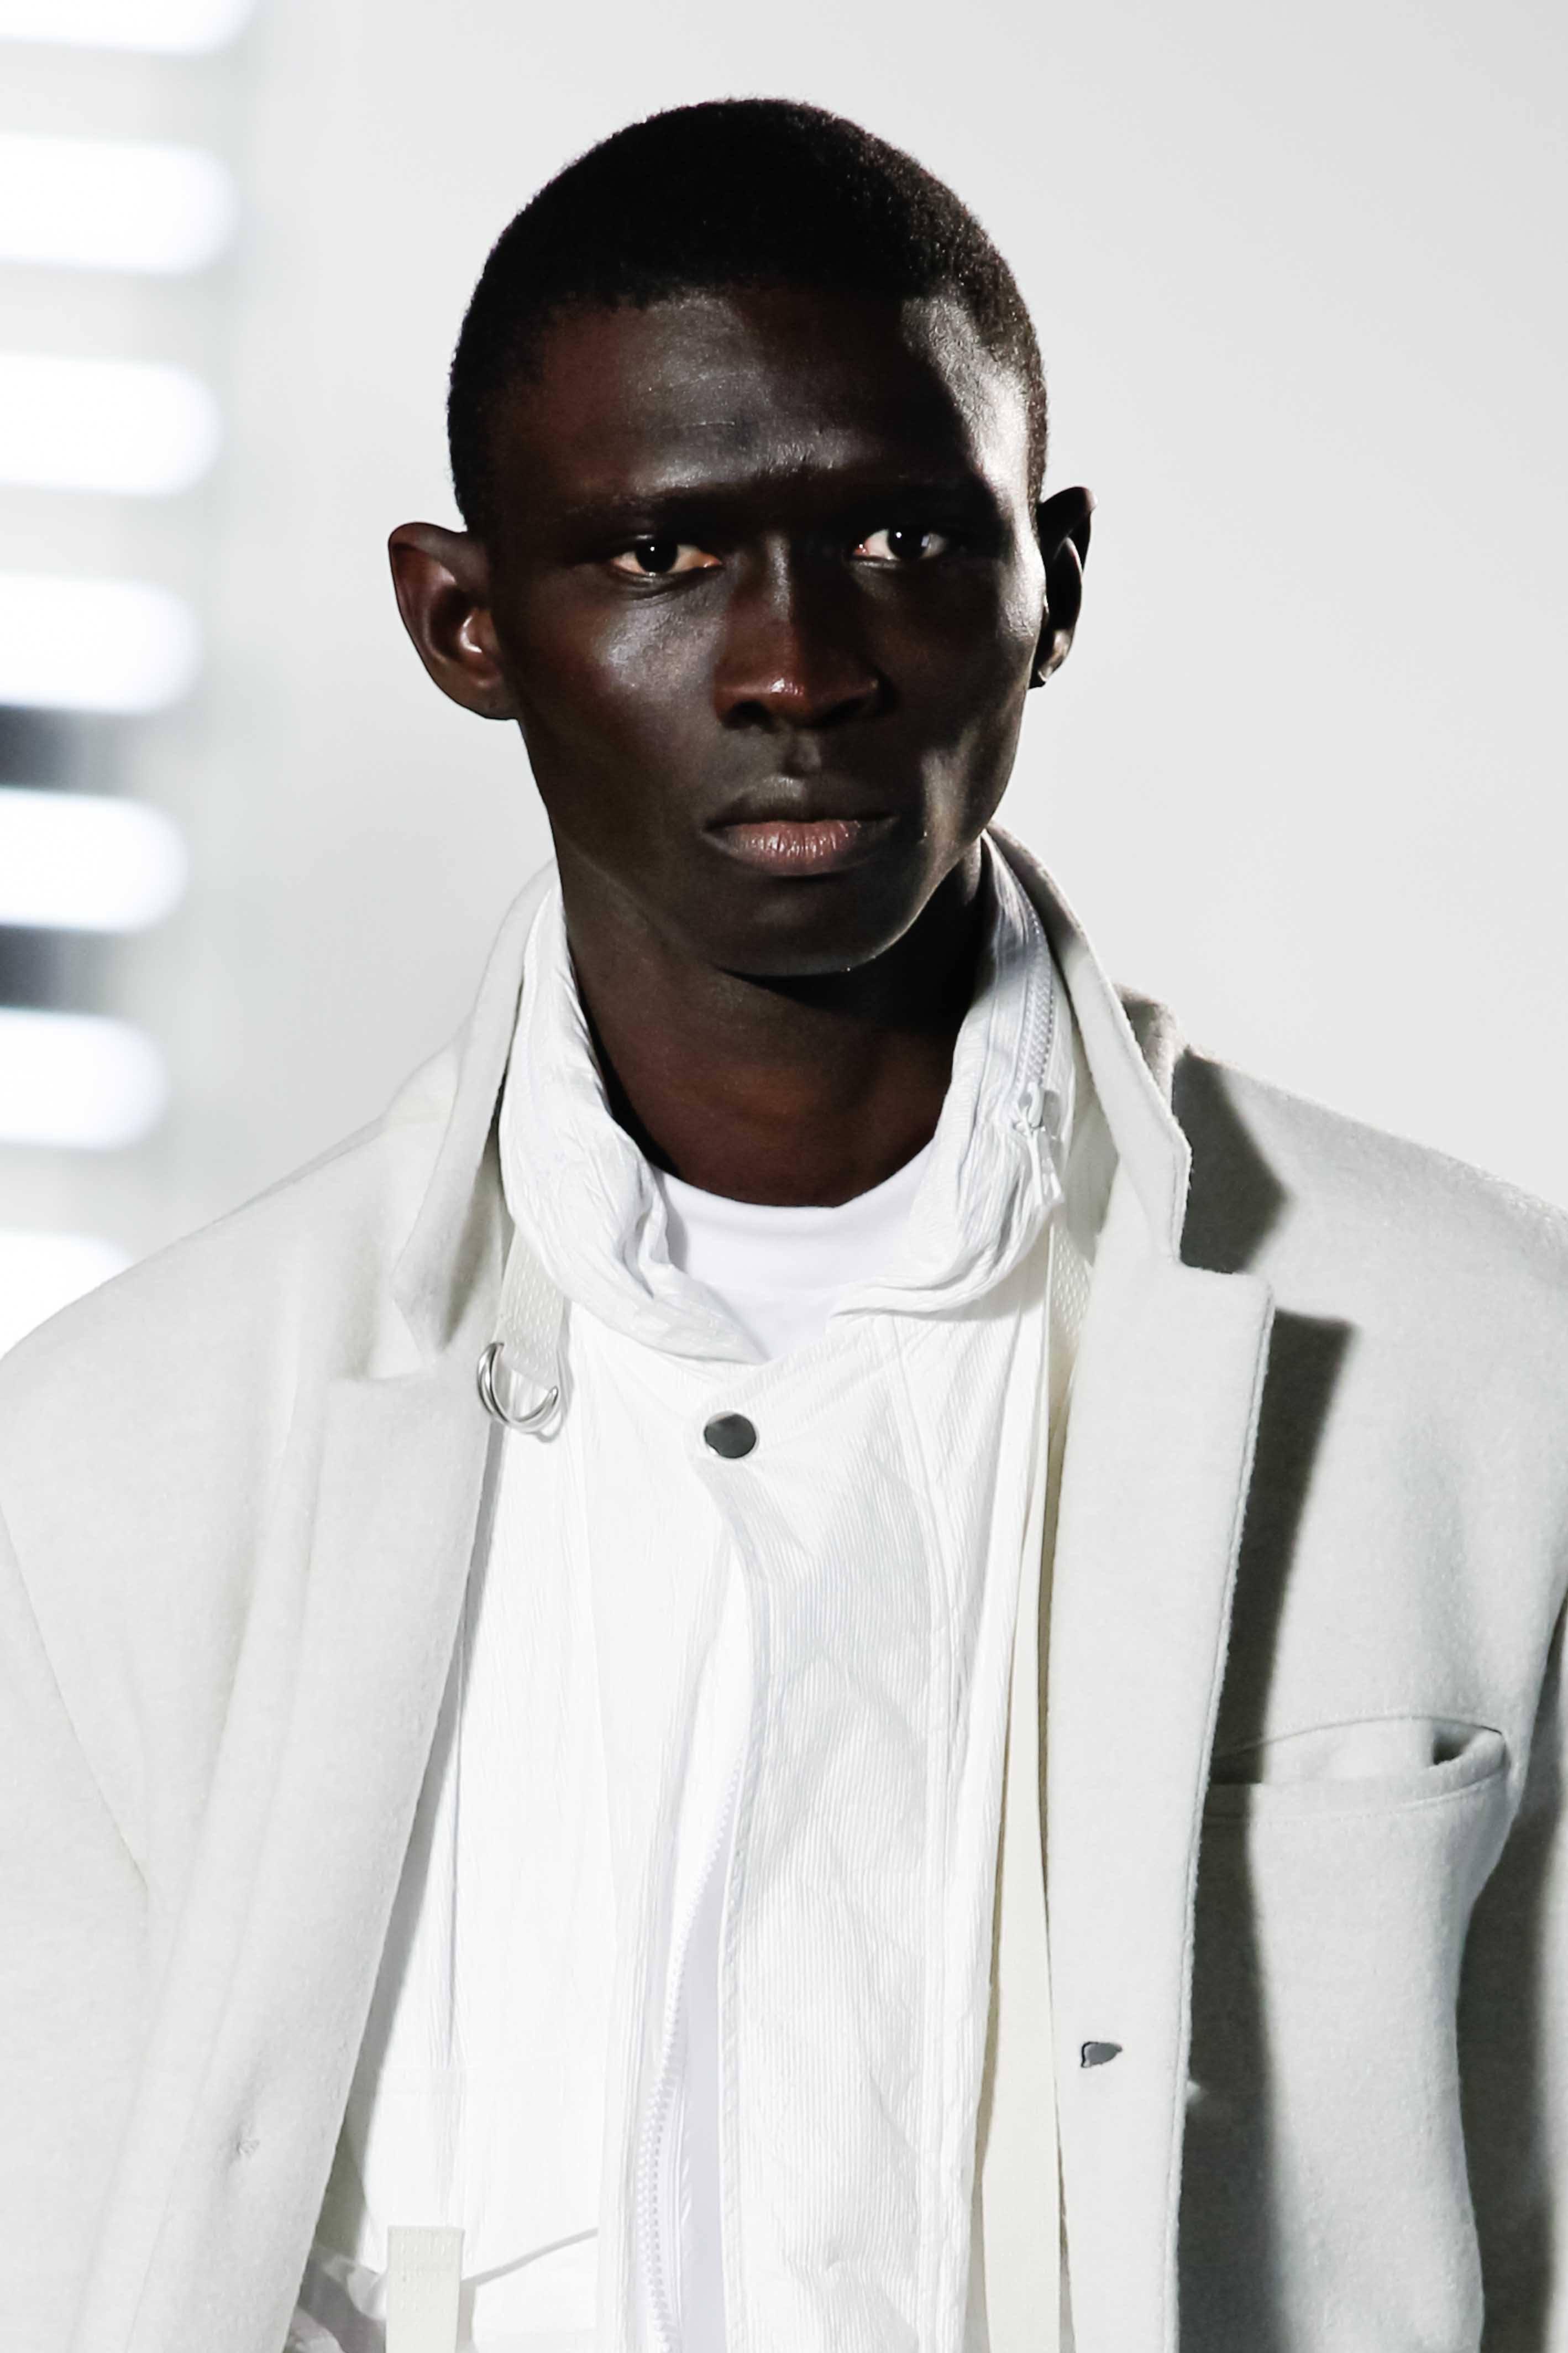 black men's hairstyles for short hair buzz cut